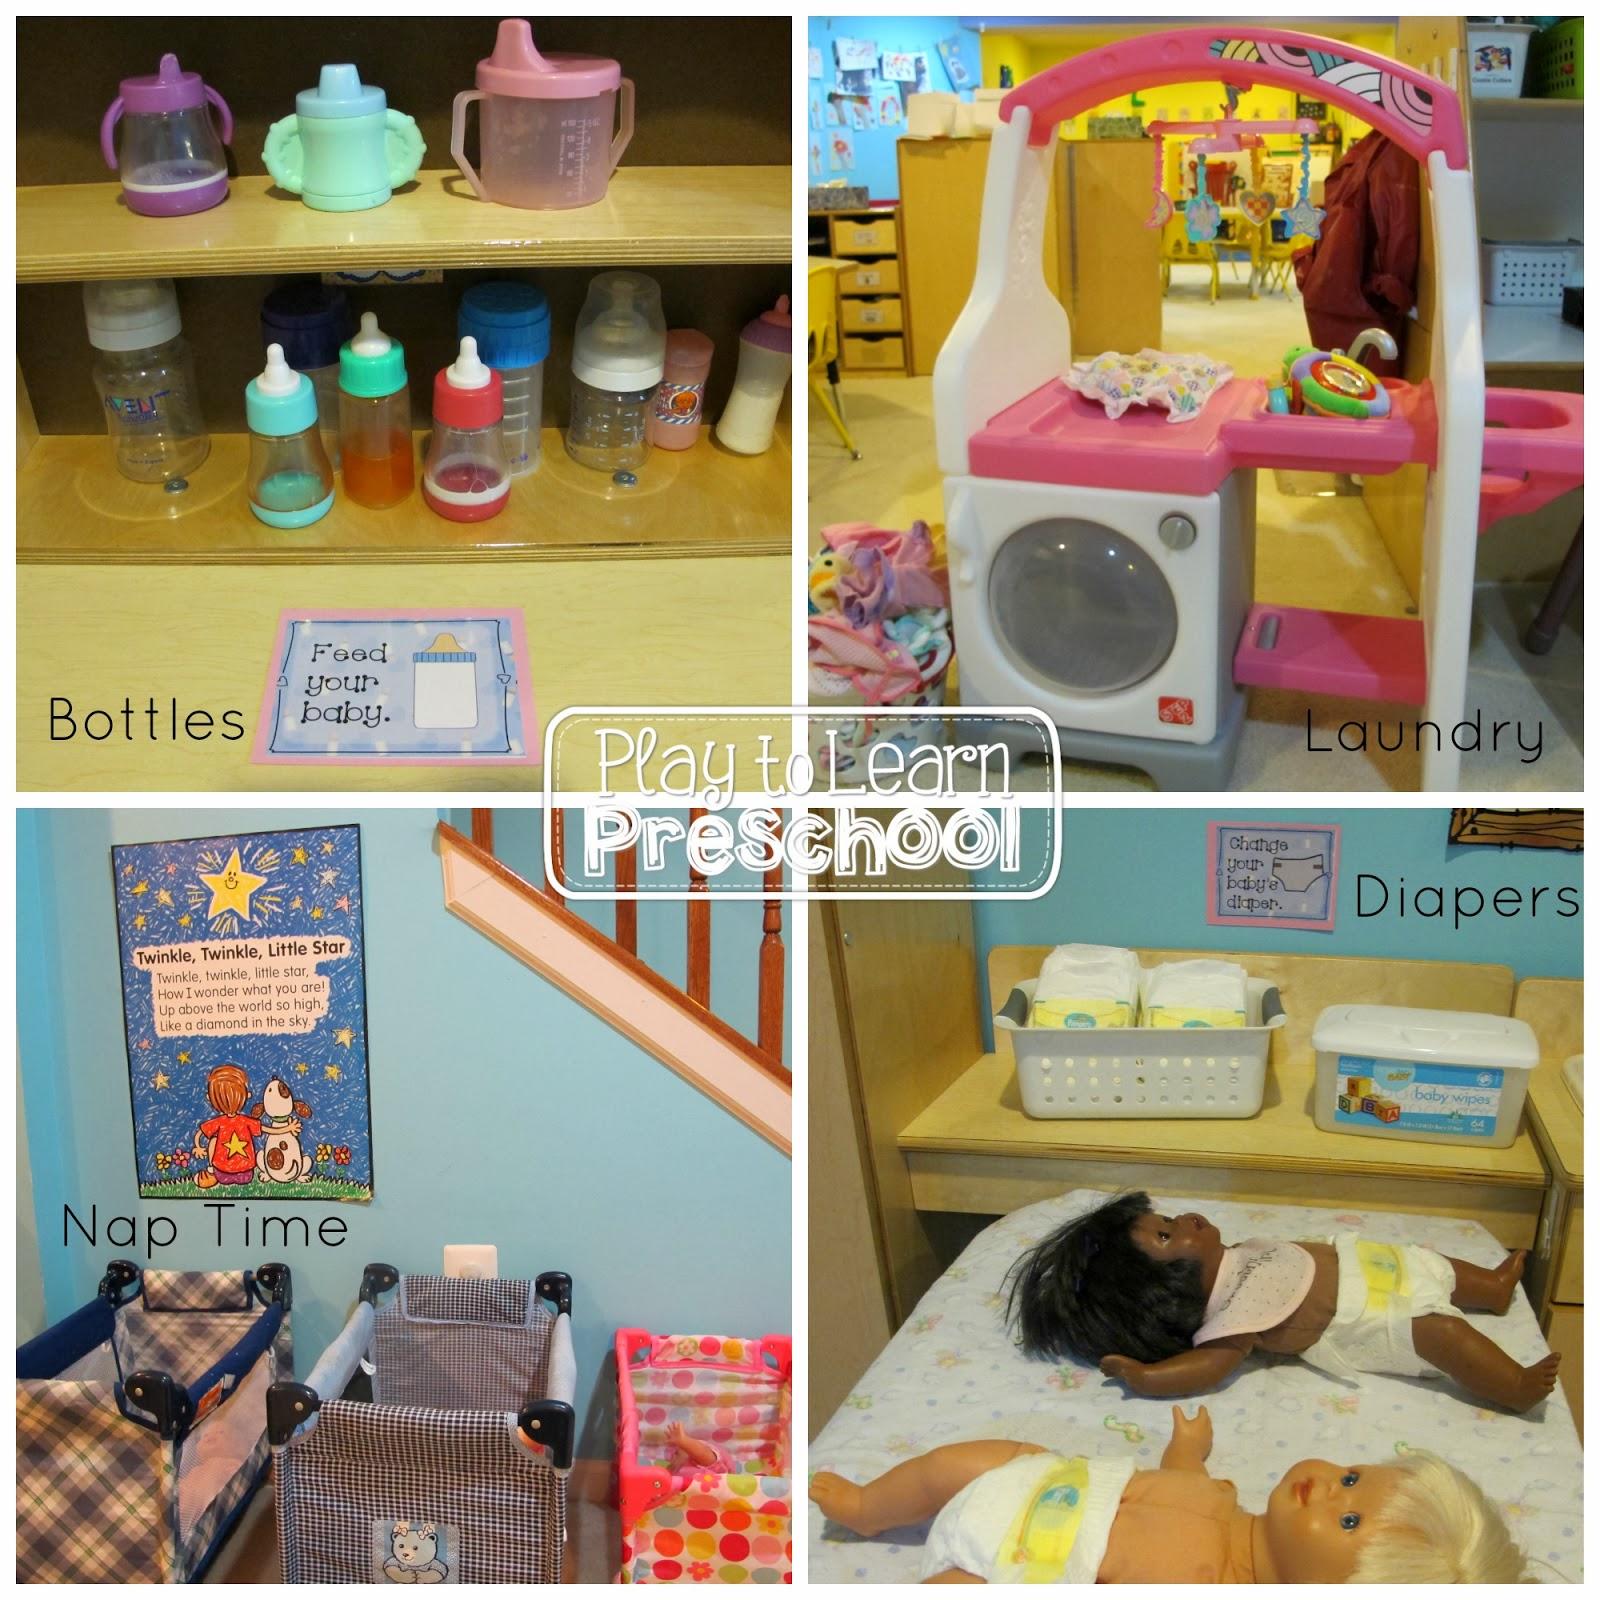 Baby Doll Nursery Dramatic Play Center for Preschoolers